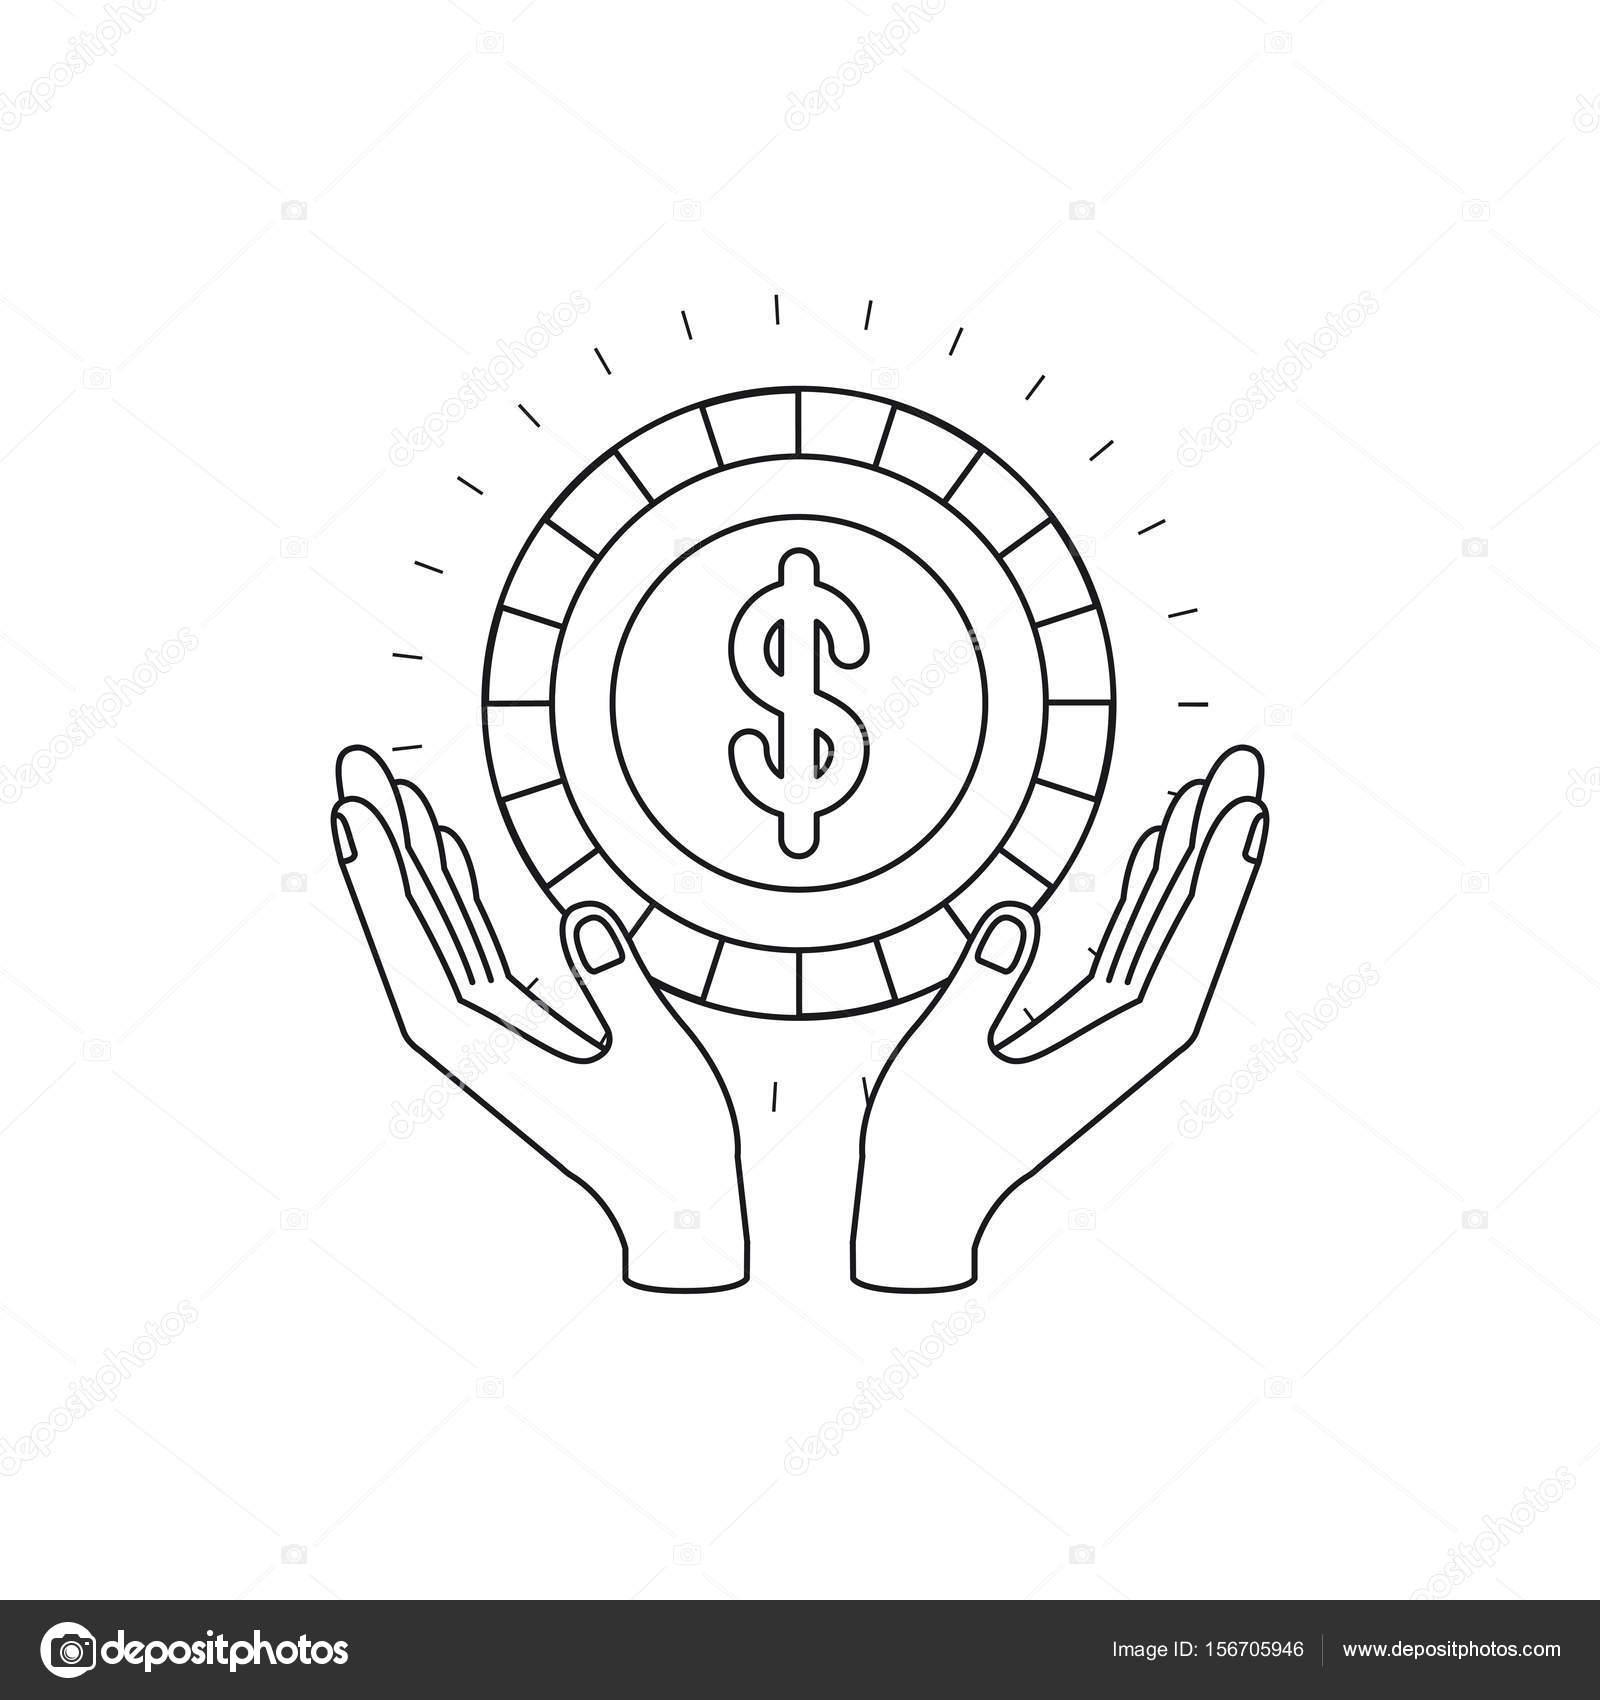 Imágenes Simbolo De Dolar Para Colorear Manos De Silueta Con